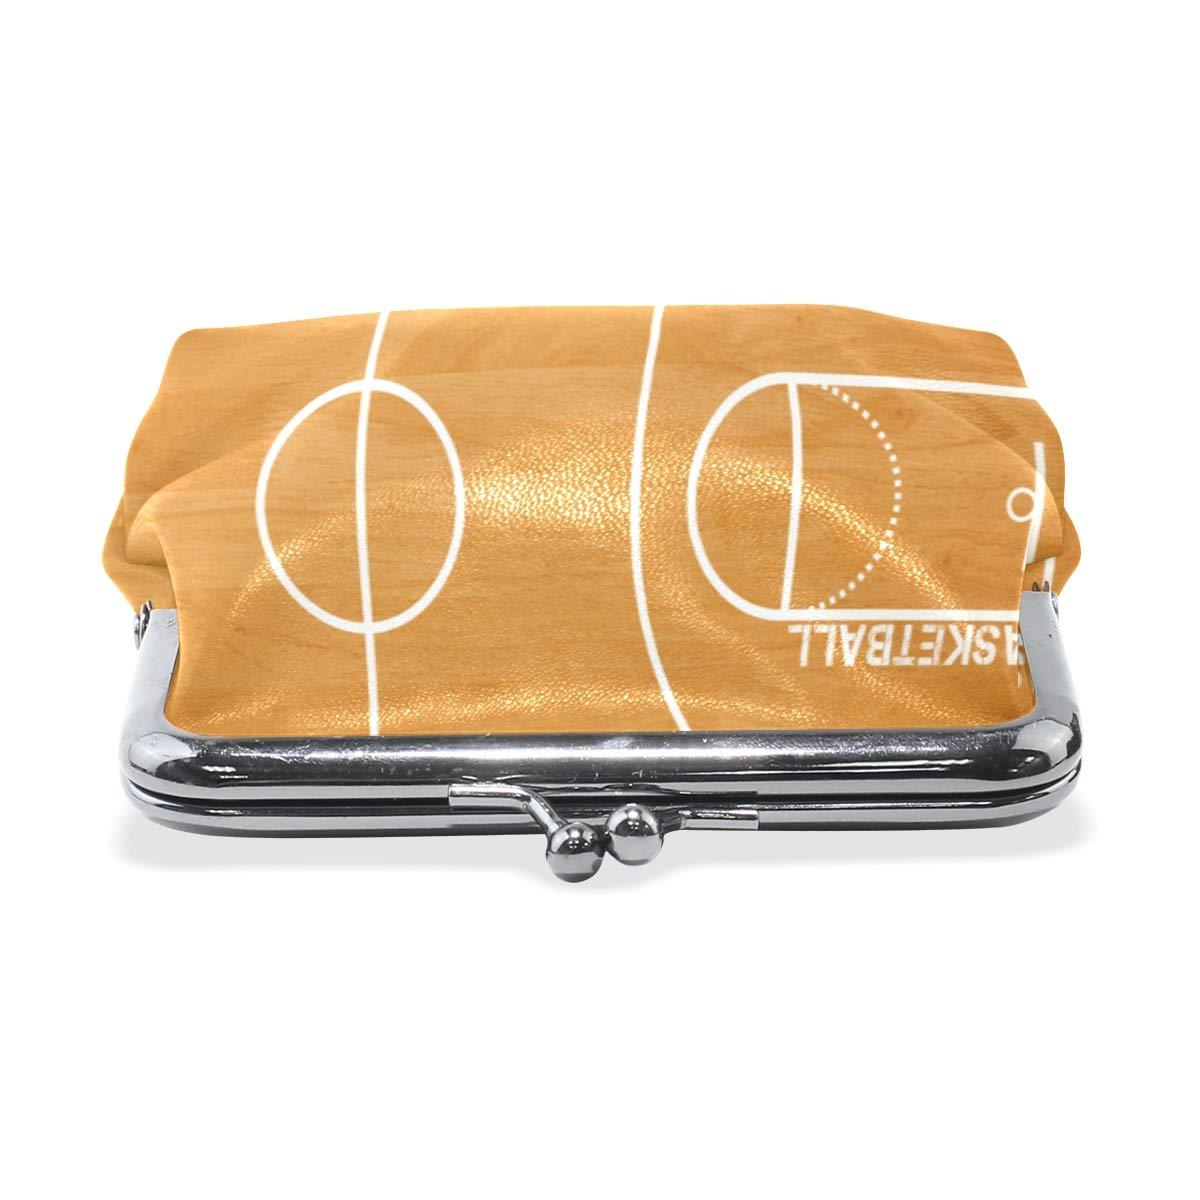 Basketball Field Plan Coin Purse Buckle Vintage PU Pouch Kiss-lock Wallet for Women Girl